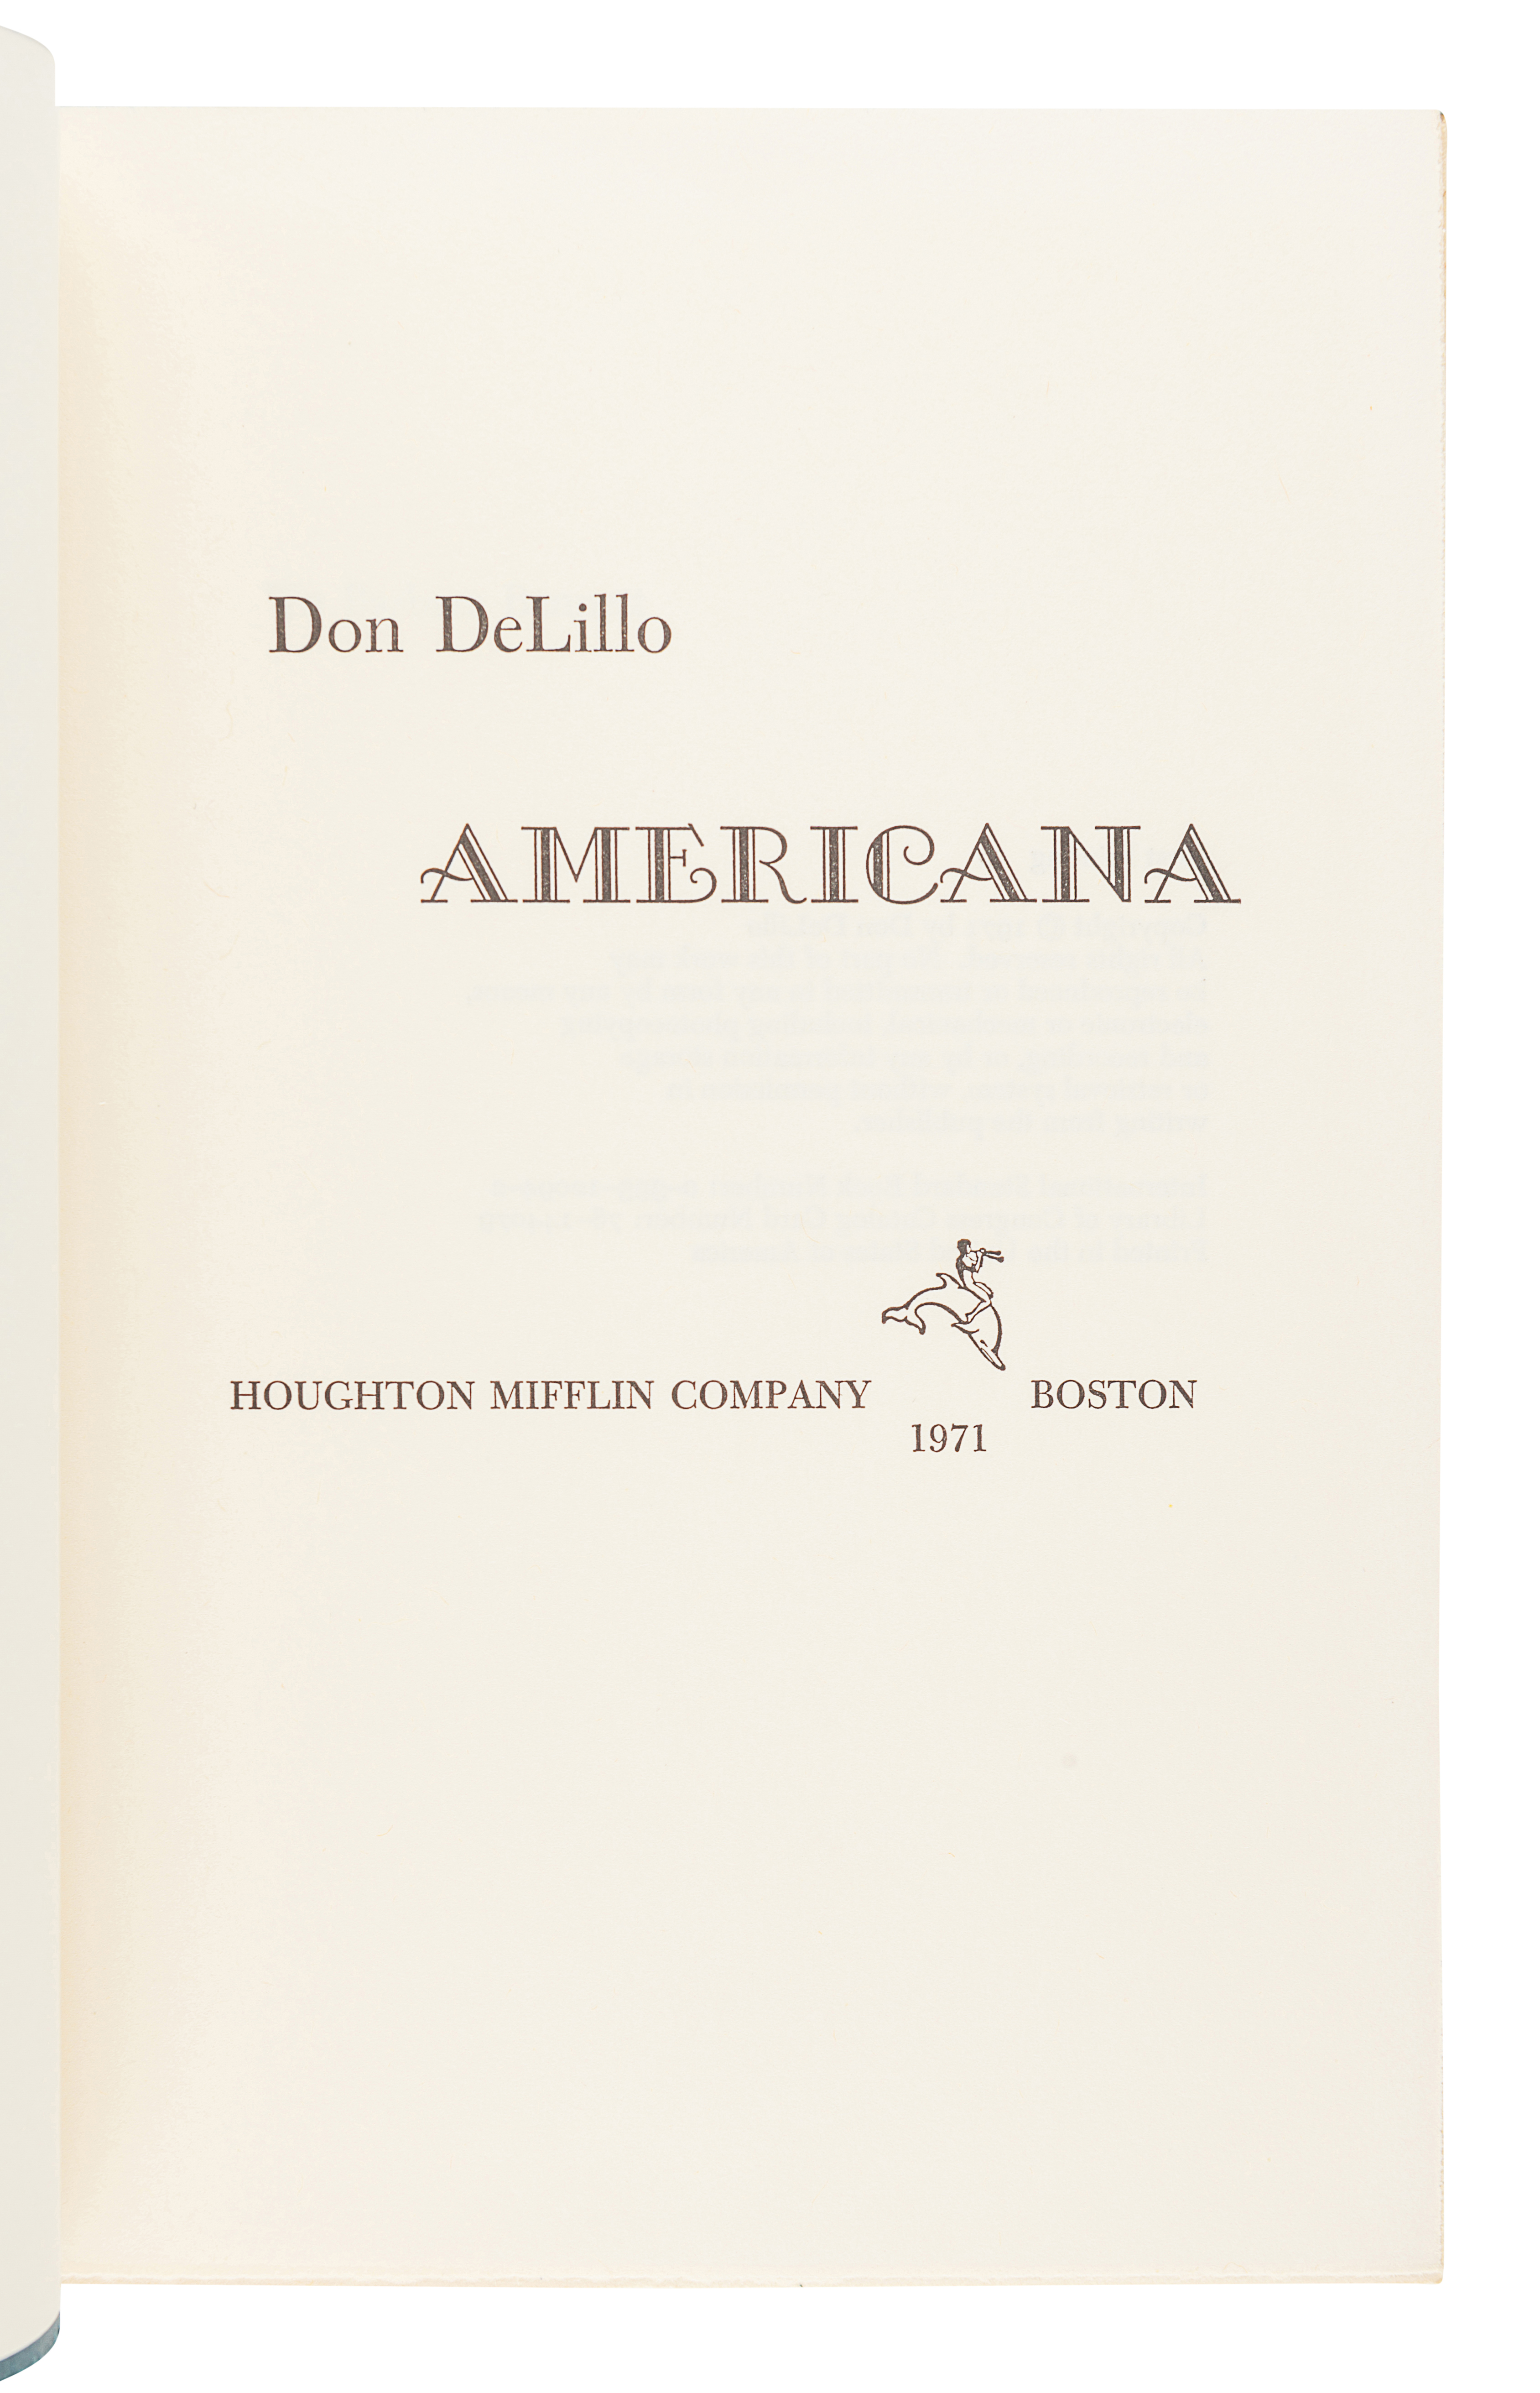 DELILLO, Don (b. 1936). Americana. Boston: Houghton Mifflin Company, 1971. - Image 3 of 3